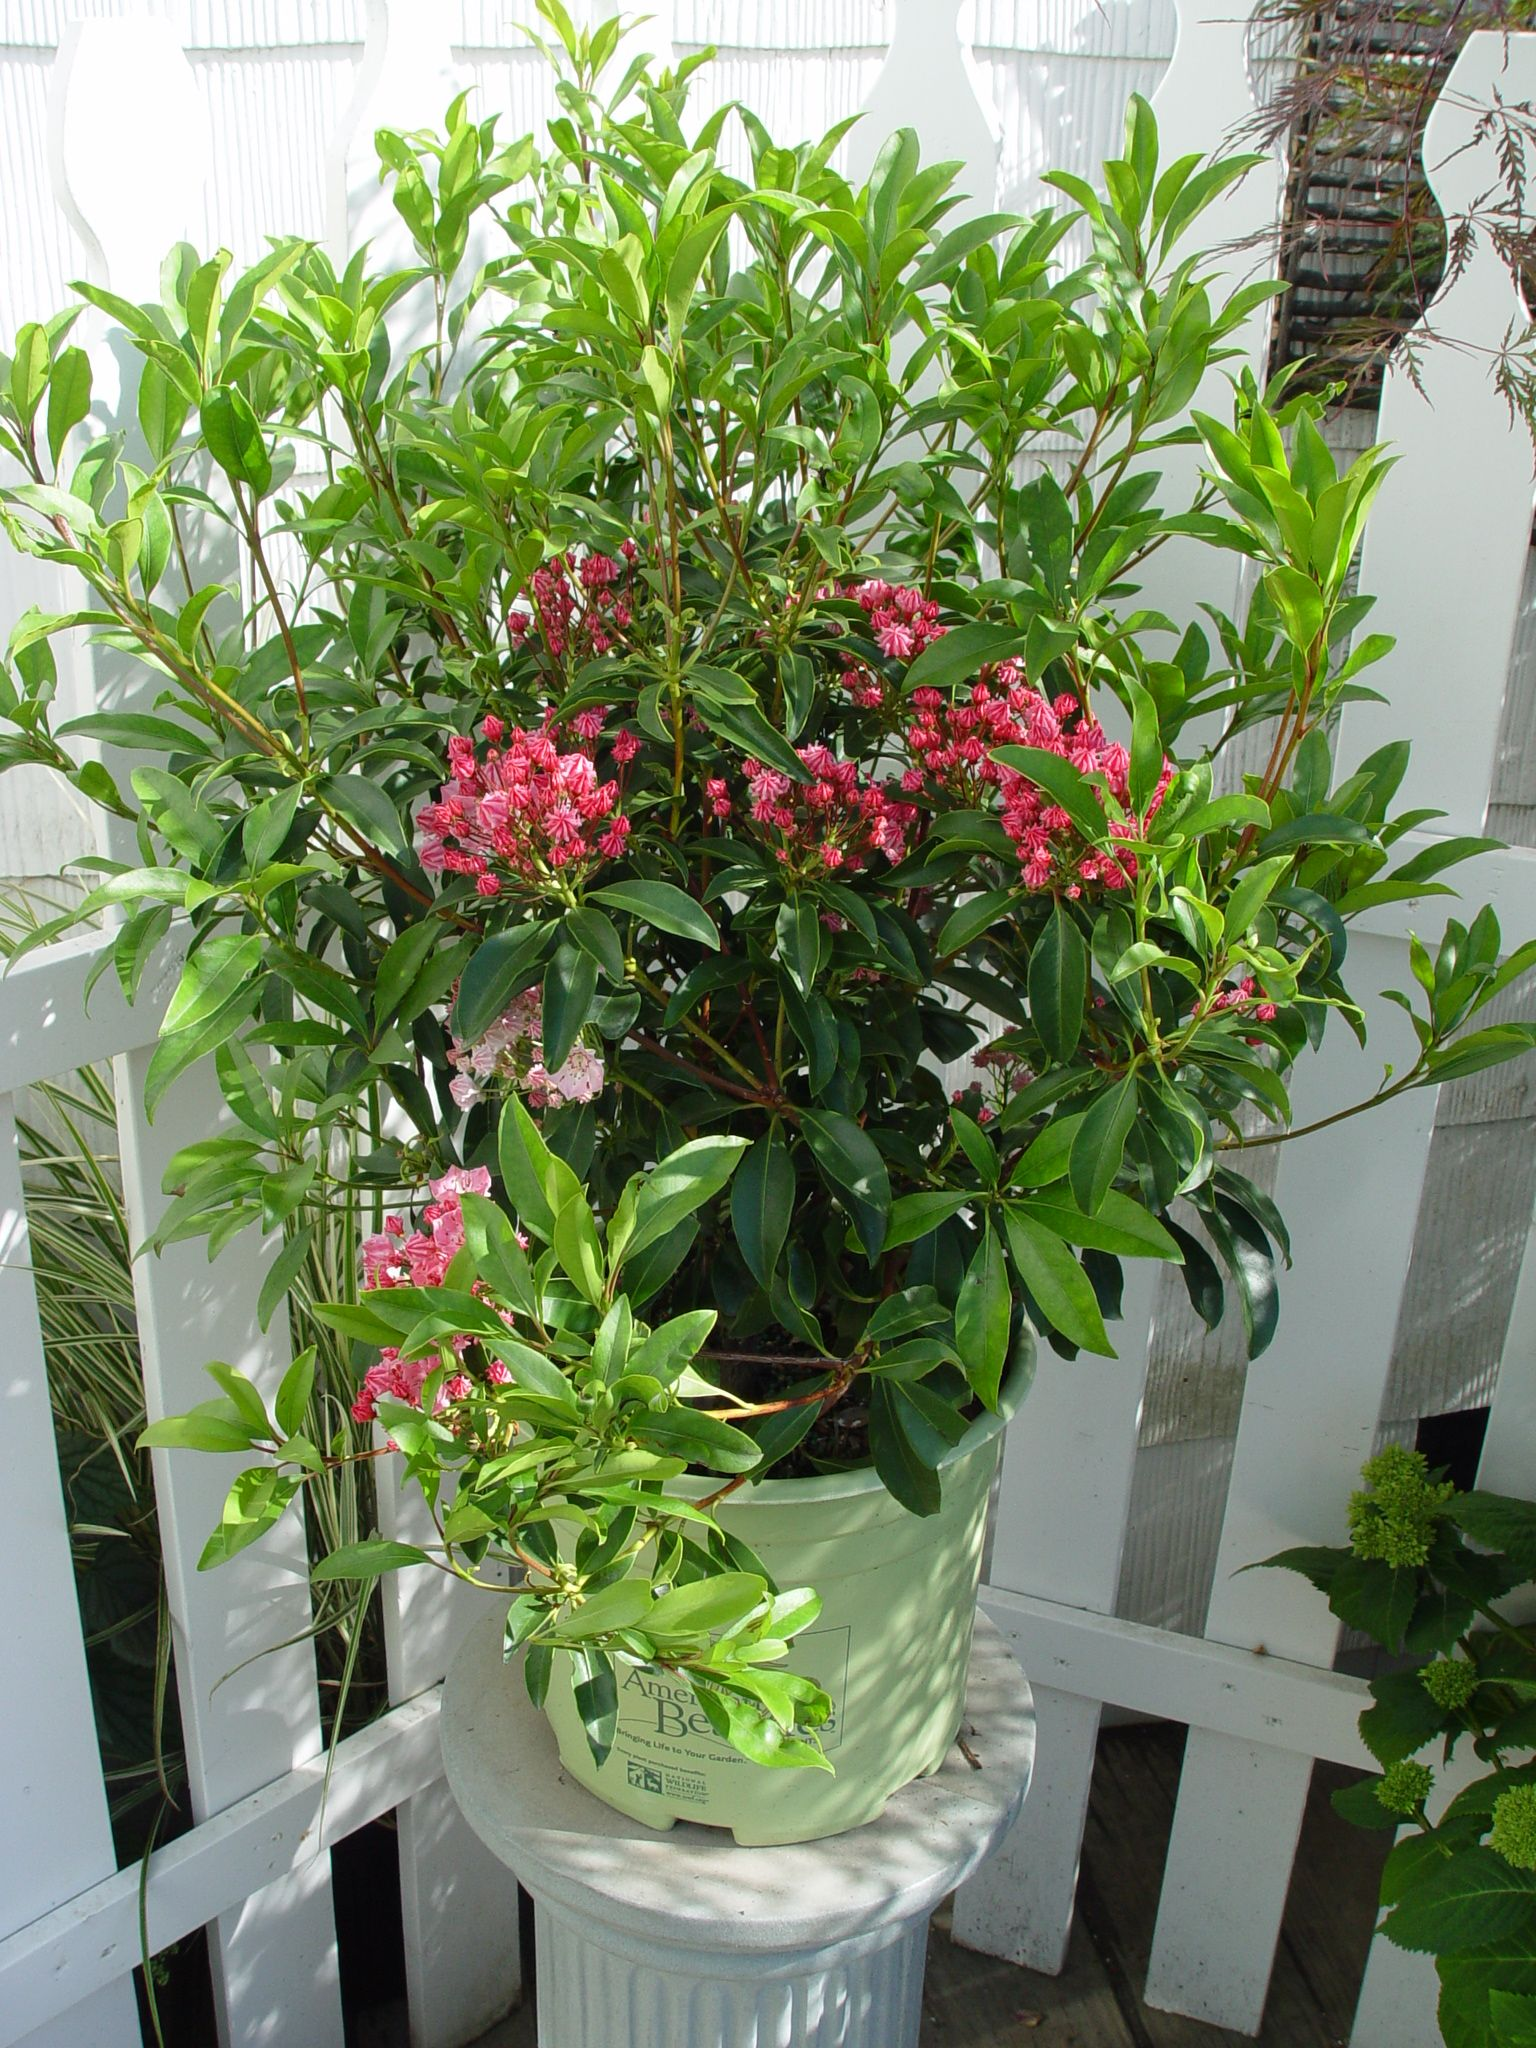 mountain laurel flower buds